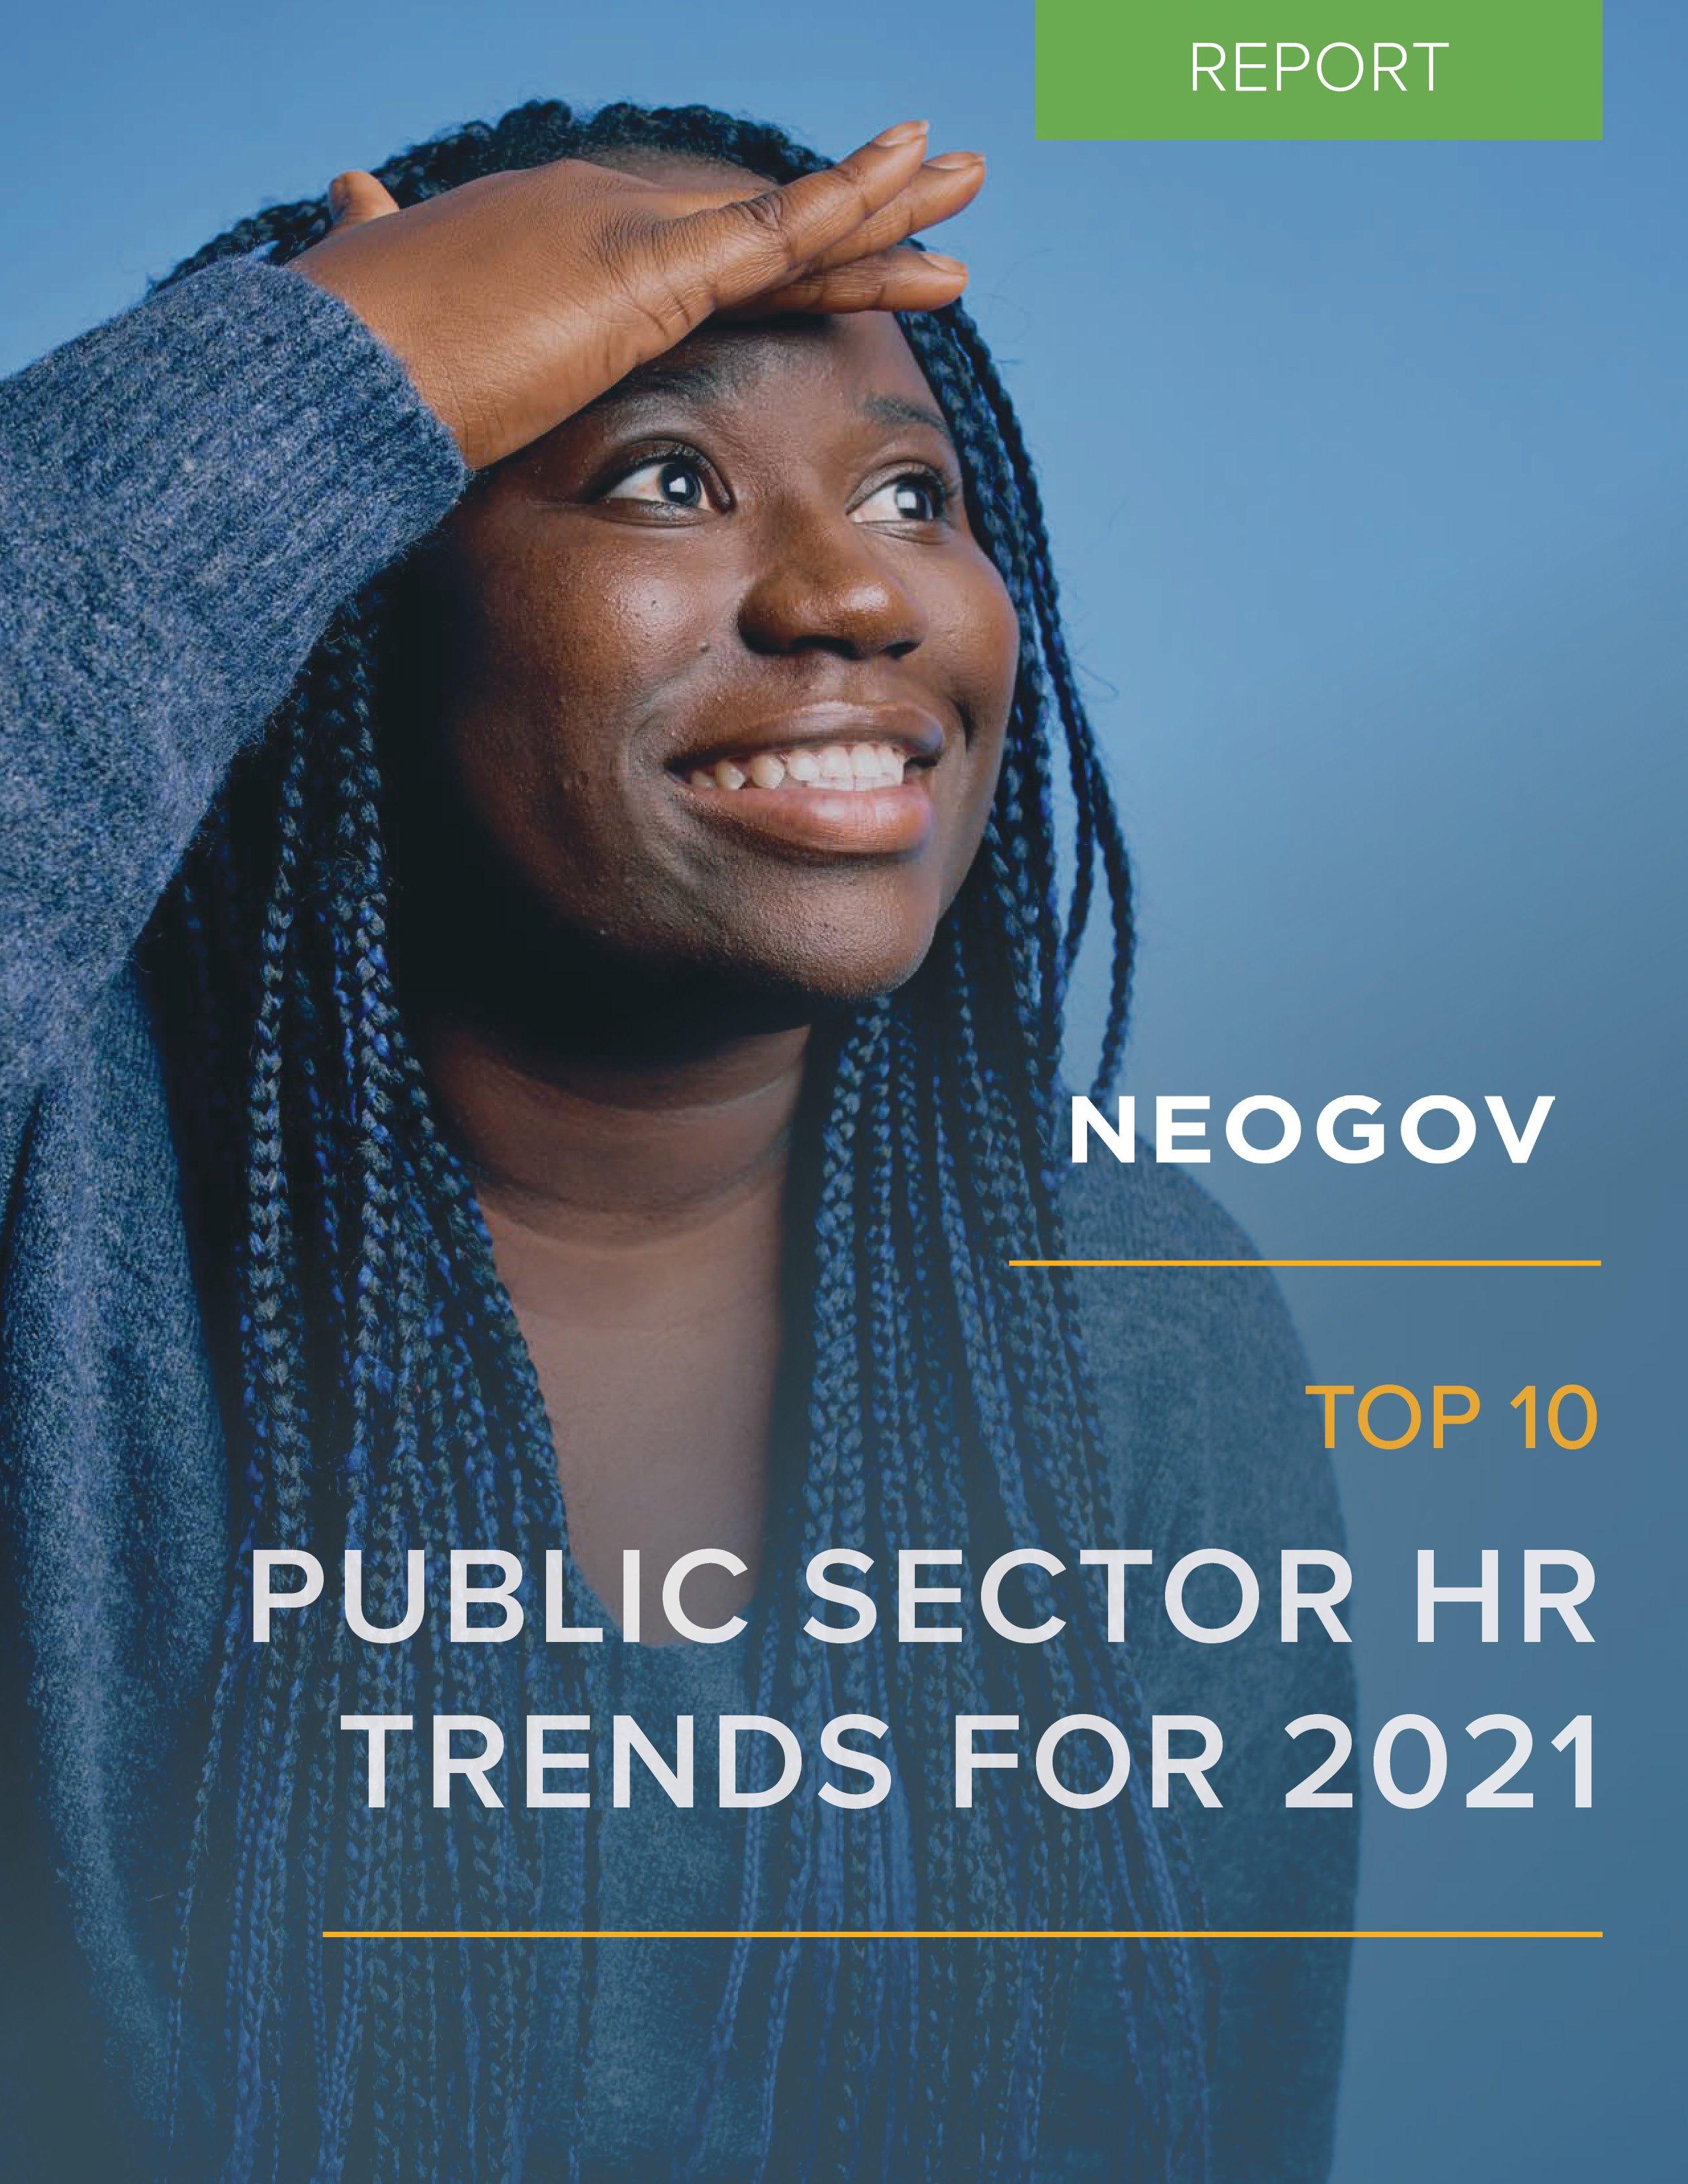 NEOGOV Top 10 Public Sector Trends for 2021